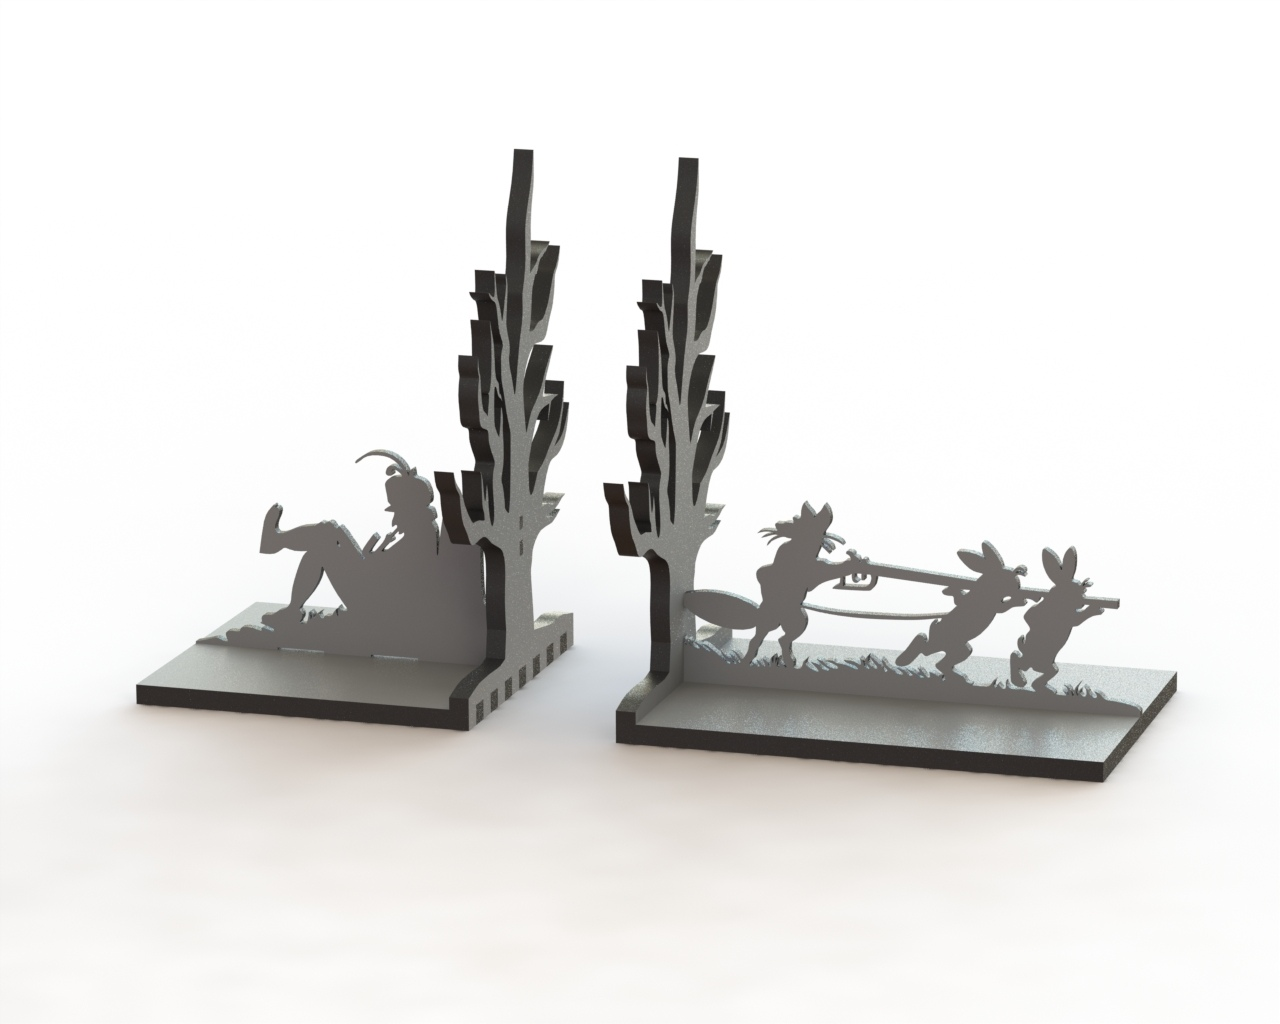 Fable Book Holder Laser Cut For Laser Cut Free CDR Vectors Art